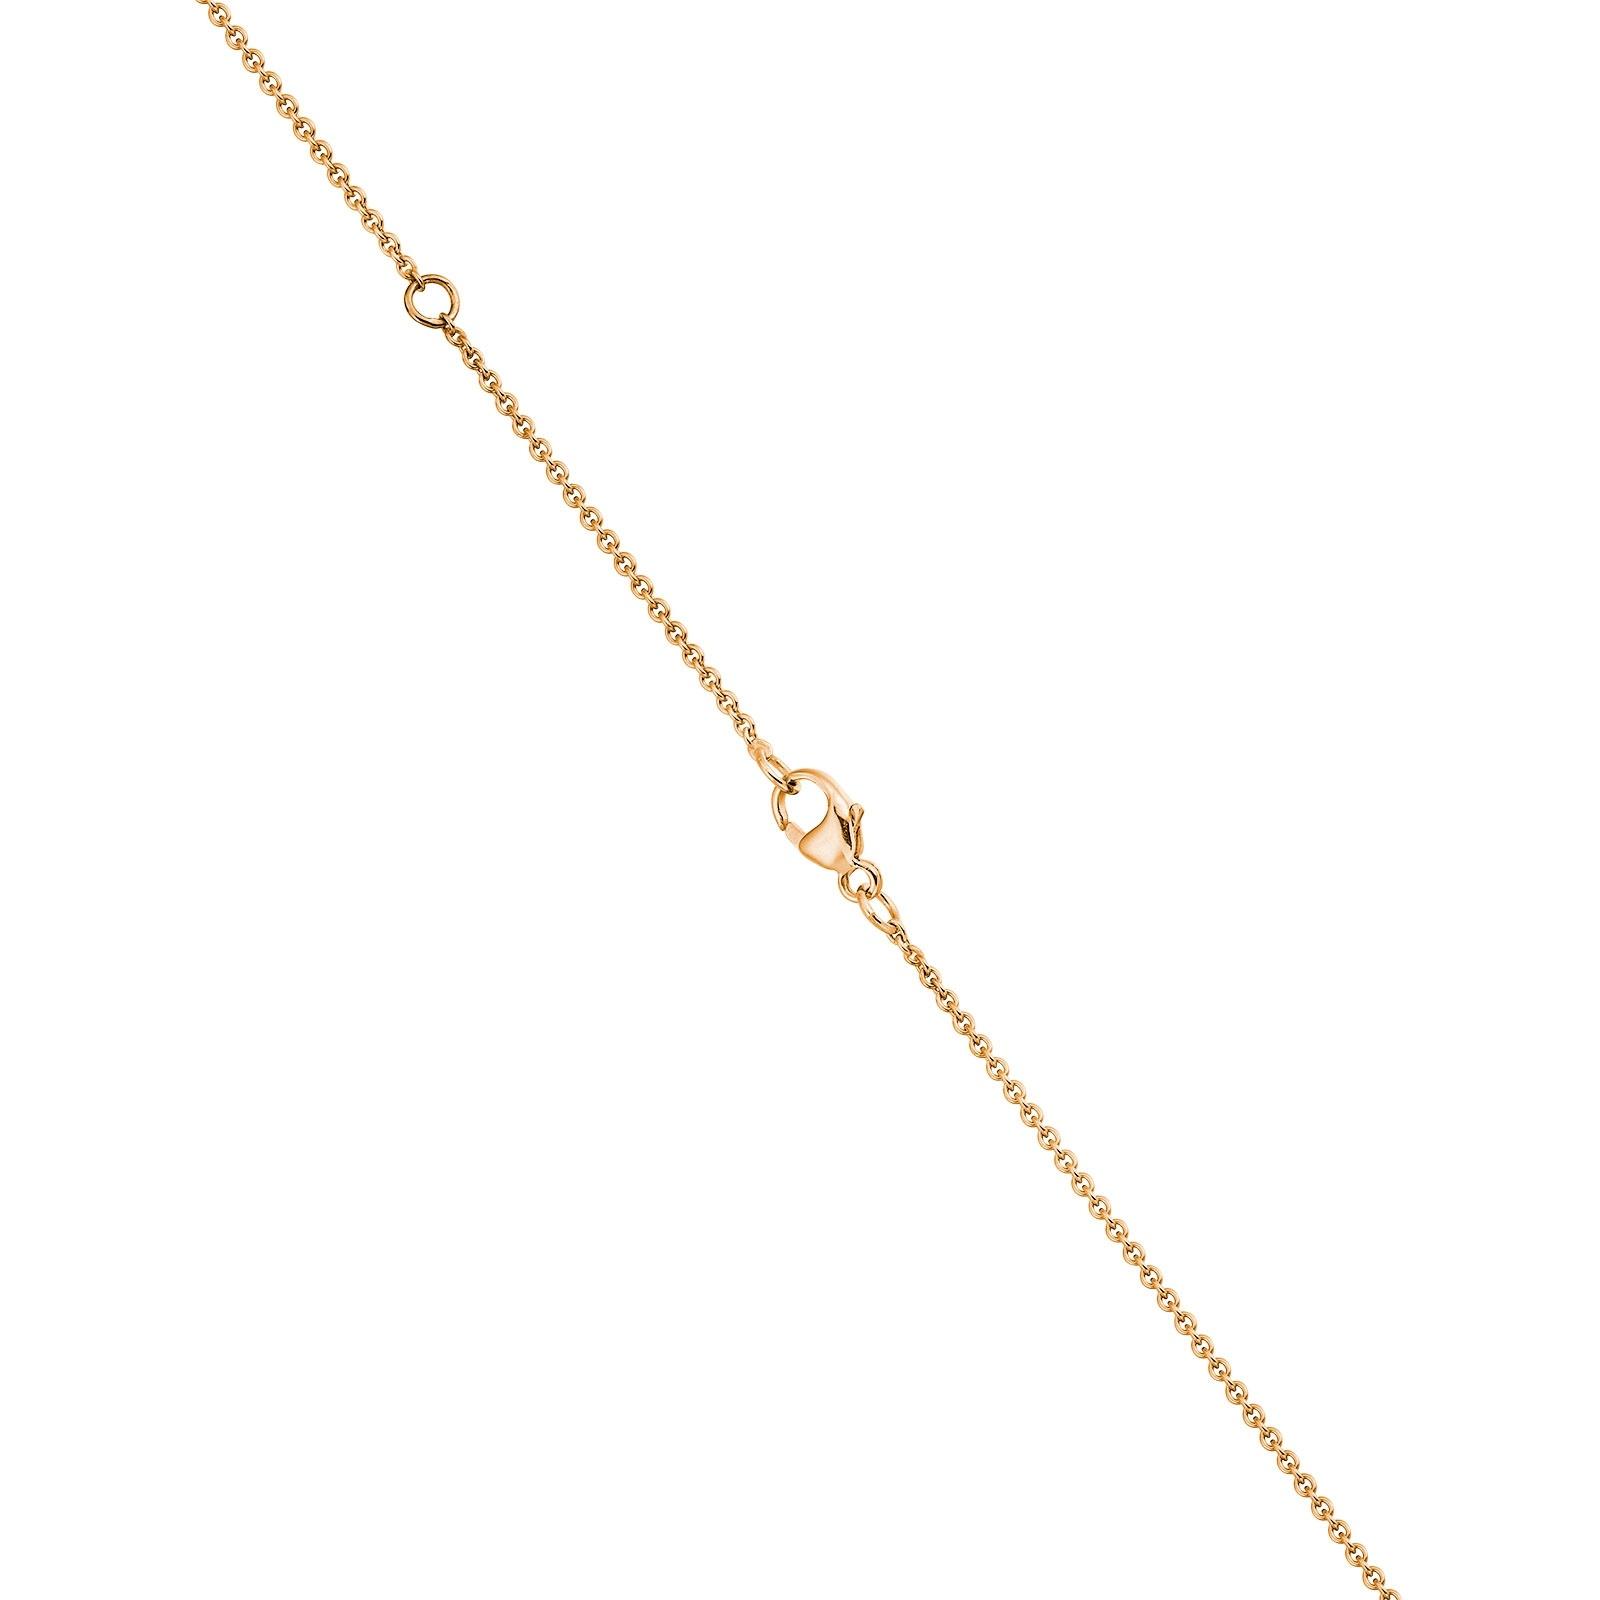 Astral Cluster Pendant in Rose Gold-PEDIRG1154-1